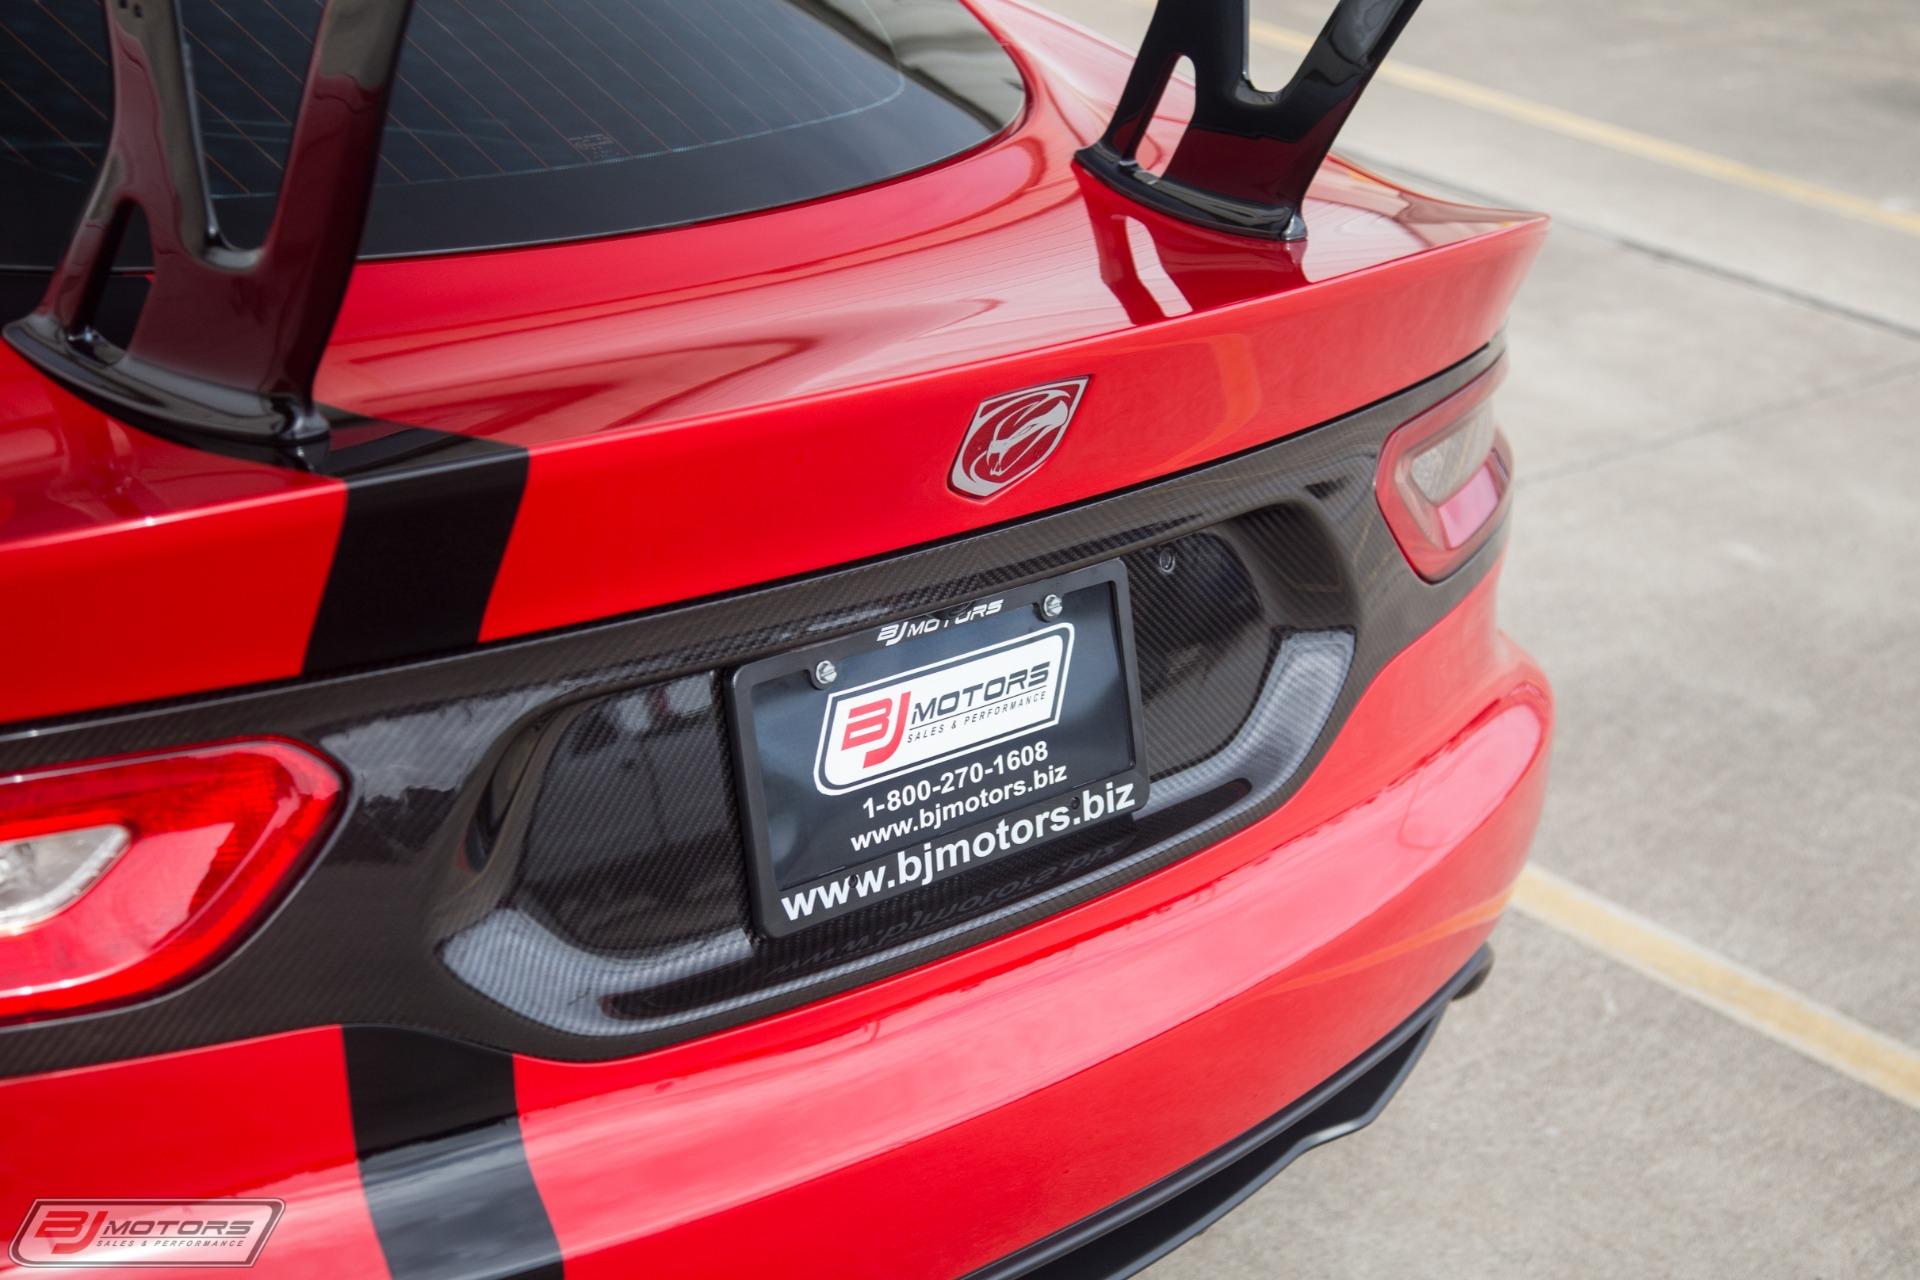 New-2016-Dodge-Viper-ACR-Extreme